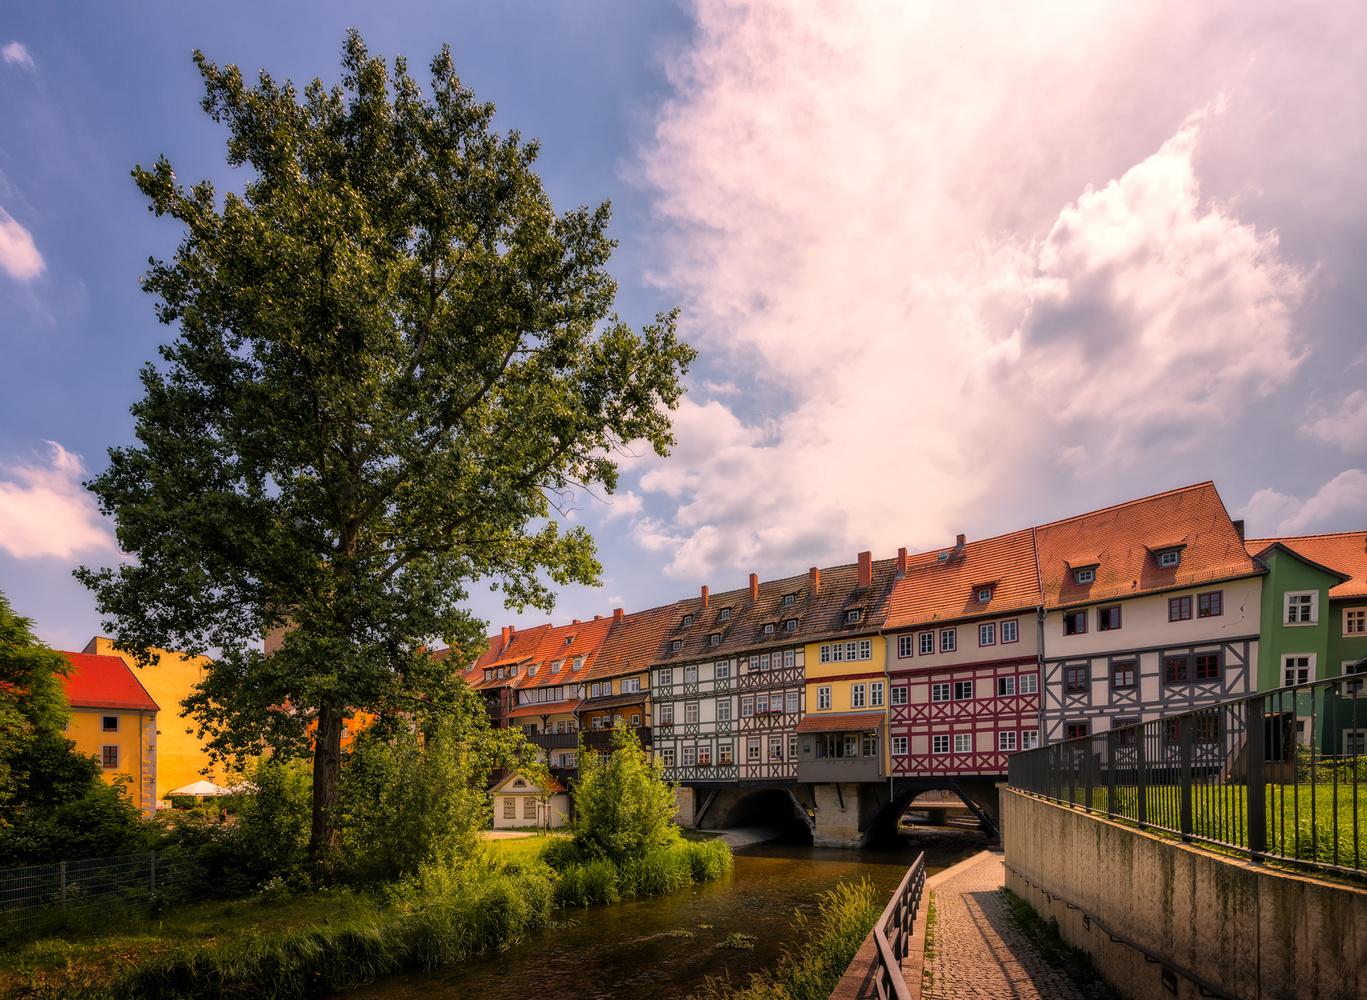 Krämerbrücke | Erfurt, Germany by Nico Trinkhaus